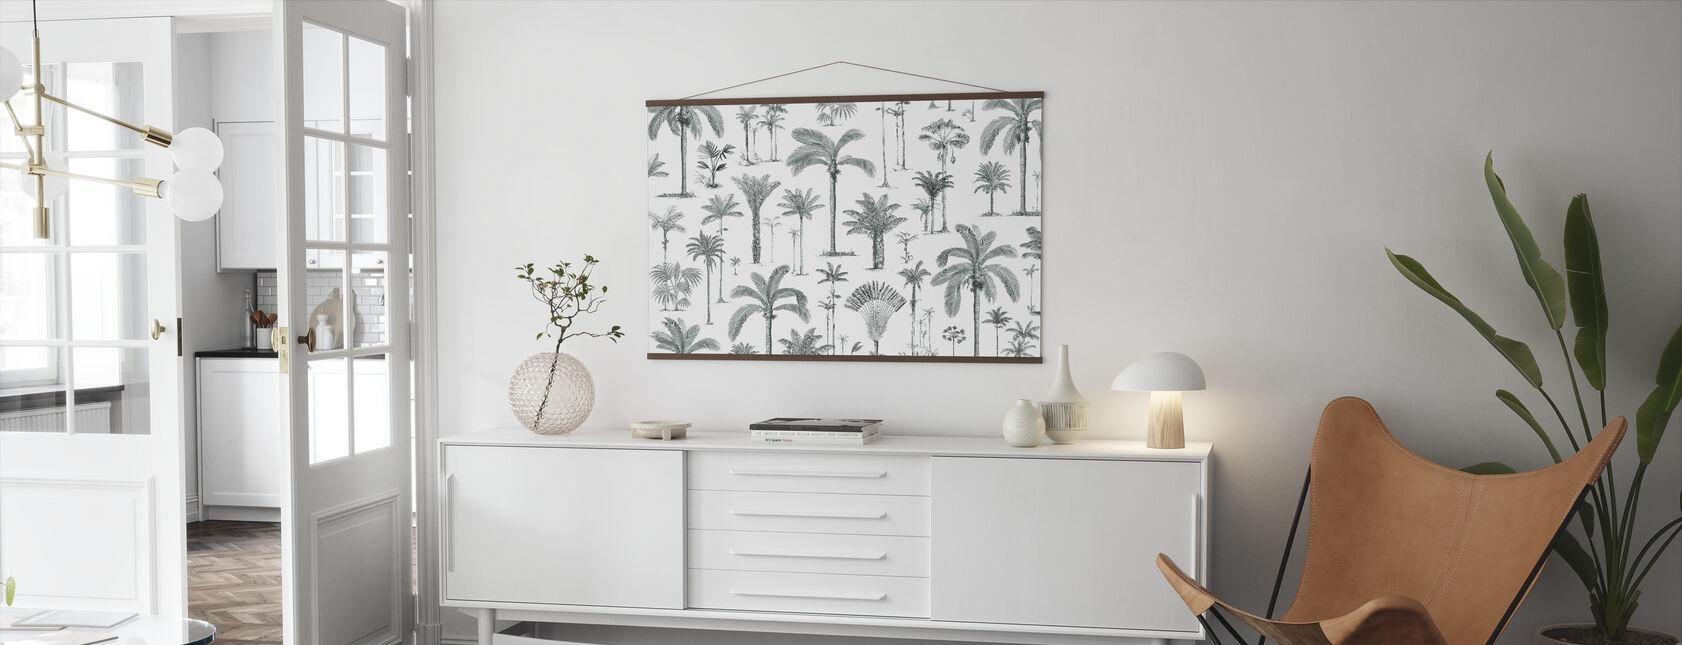 Brasilianske palmer - askegrøn - Plakat - Stue